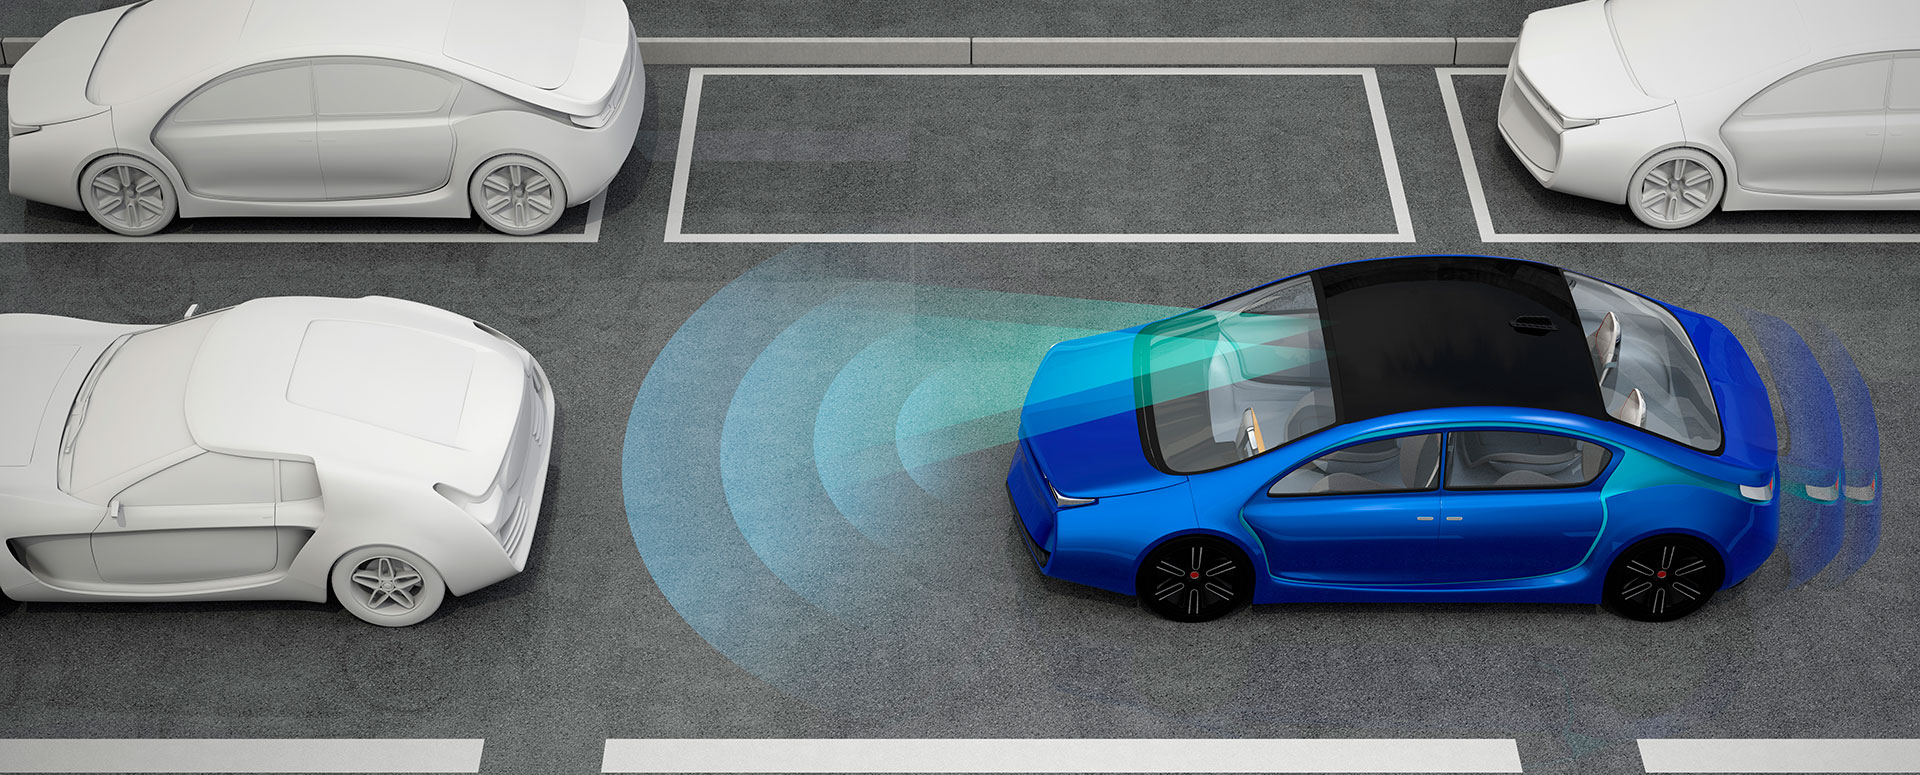 Driver-less Cars  by Bill Mixon